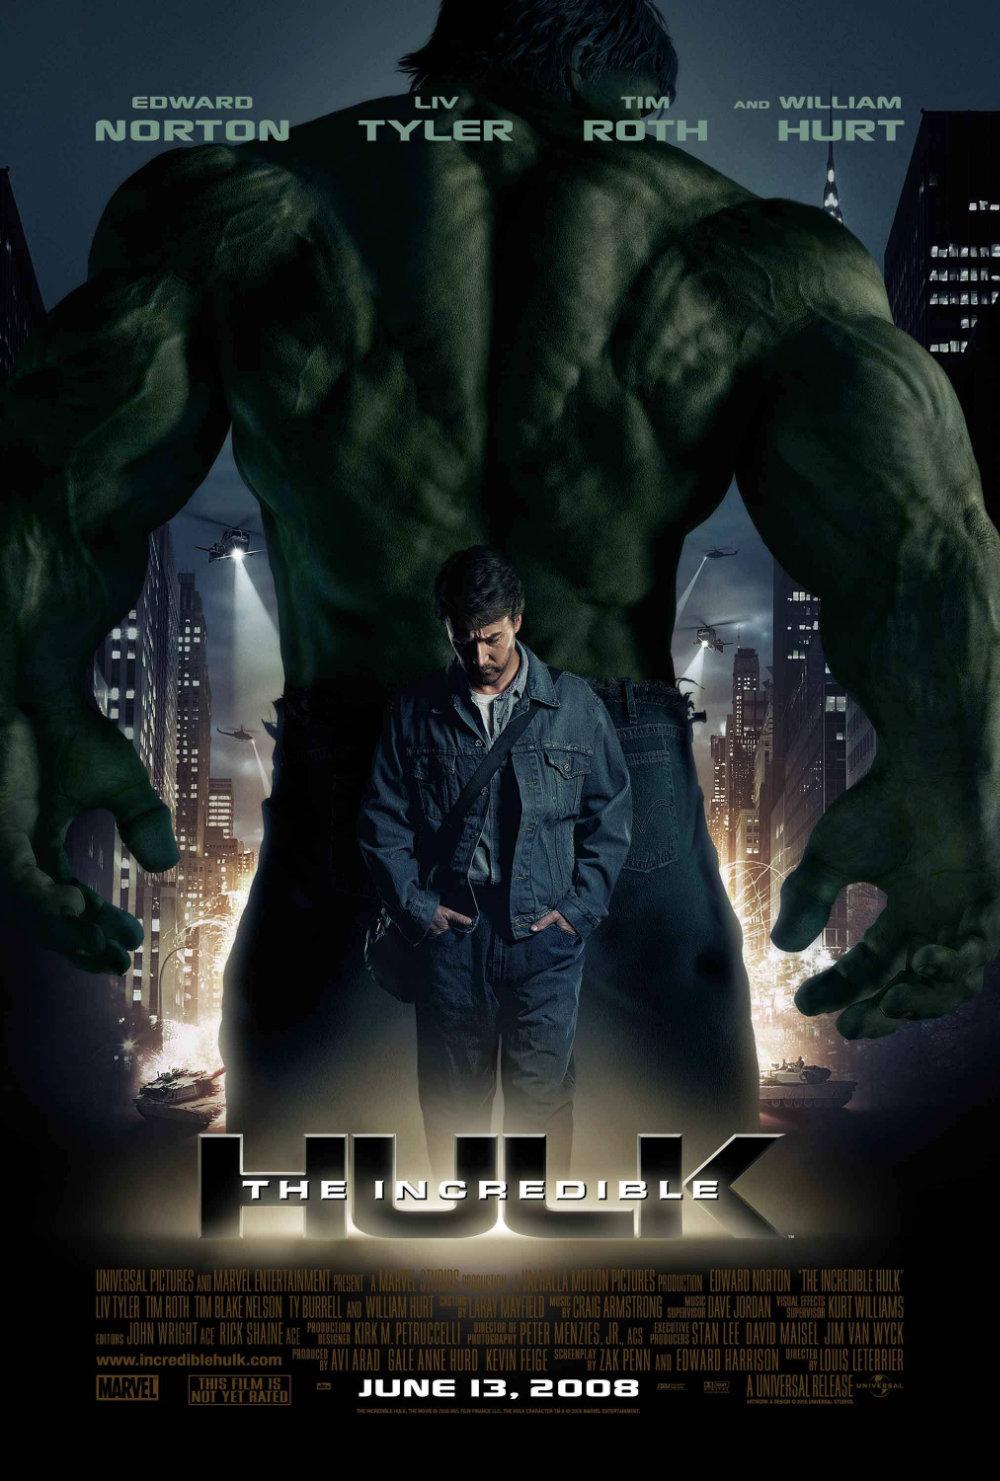 DVD Review: The Incredible Hulk